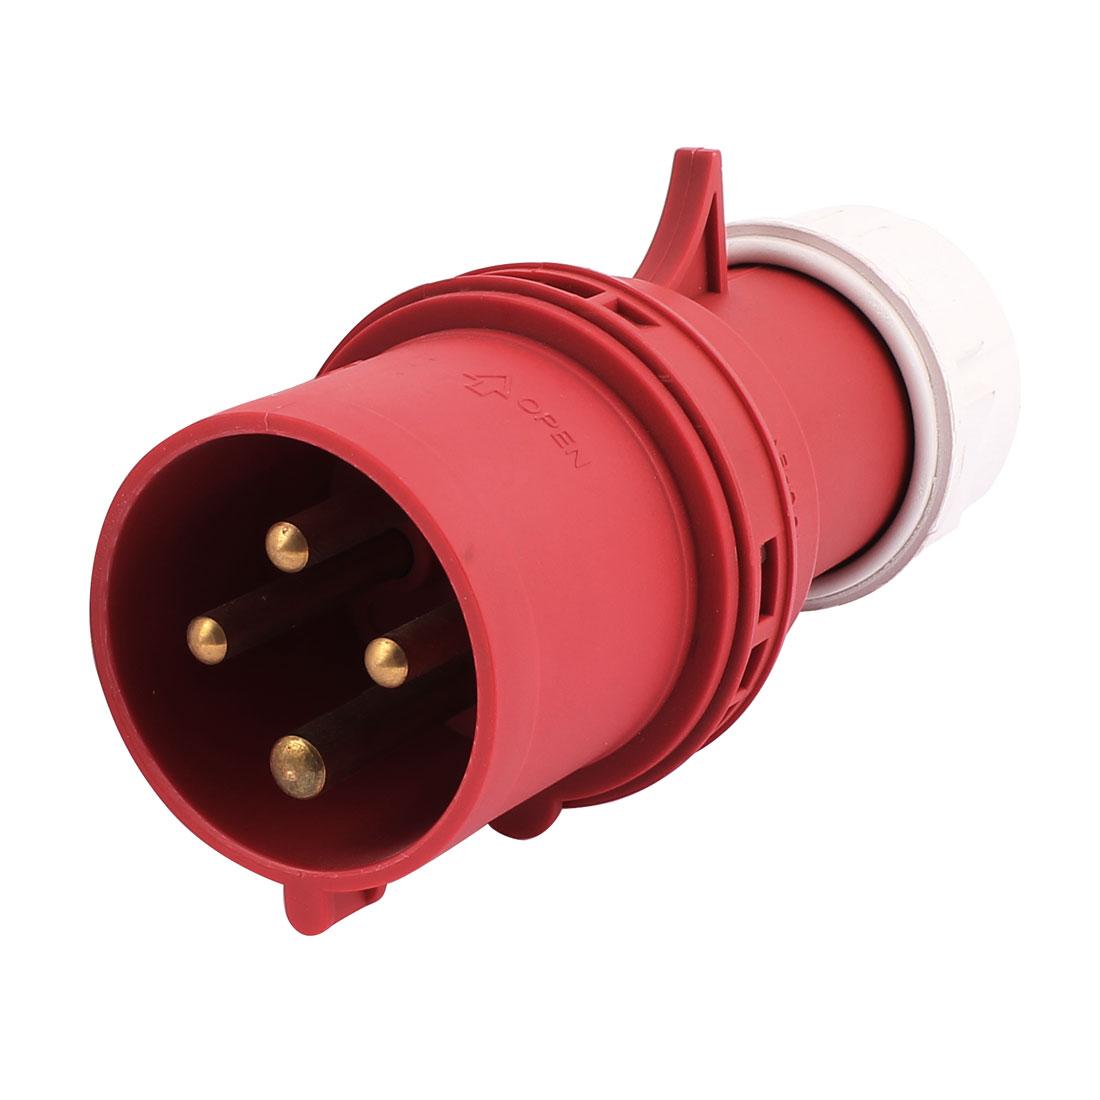 AC 380V-415V 21A IP44 3P+E 4-Terminal Male Industrial Electrical Plug